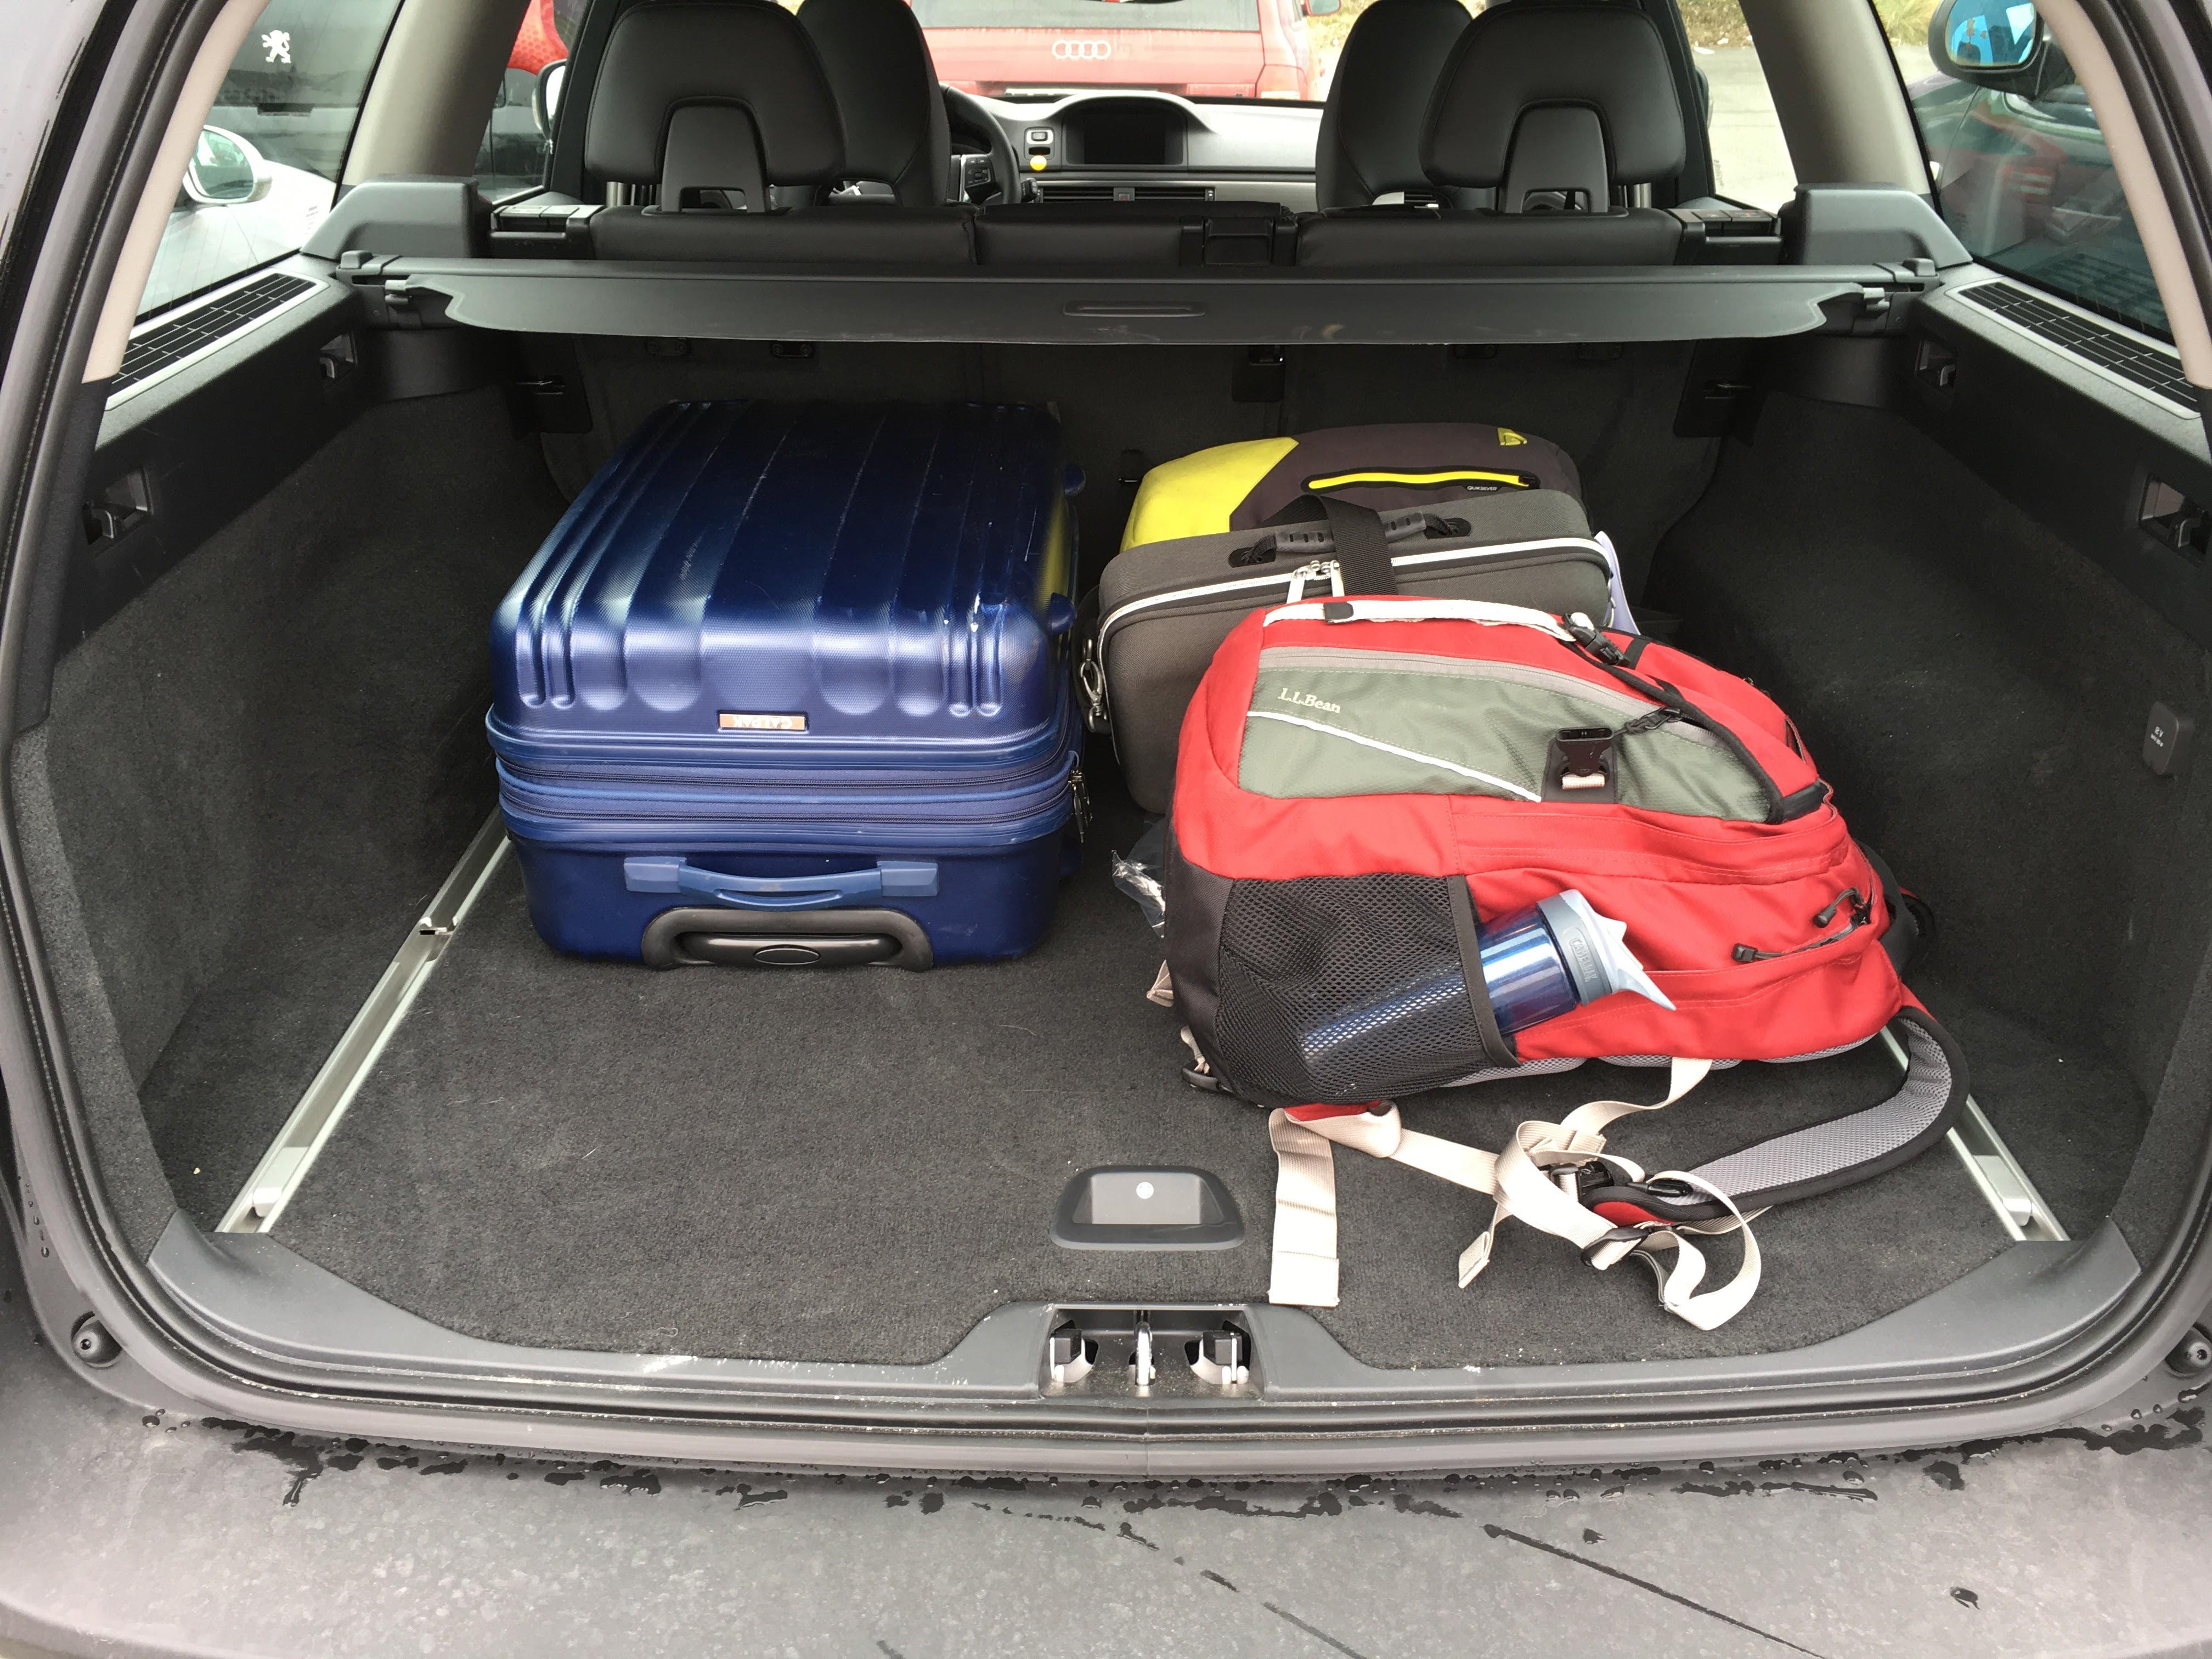 Half-empty trunk